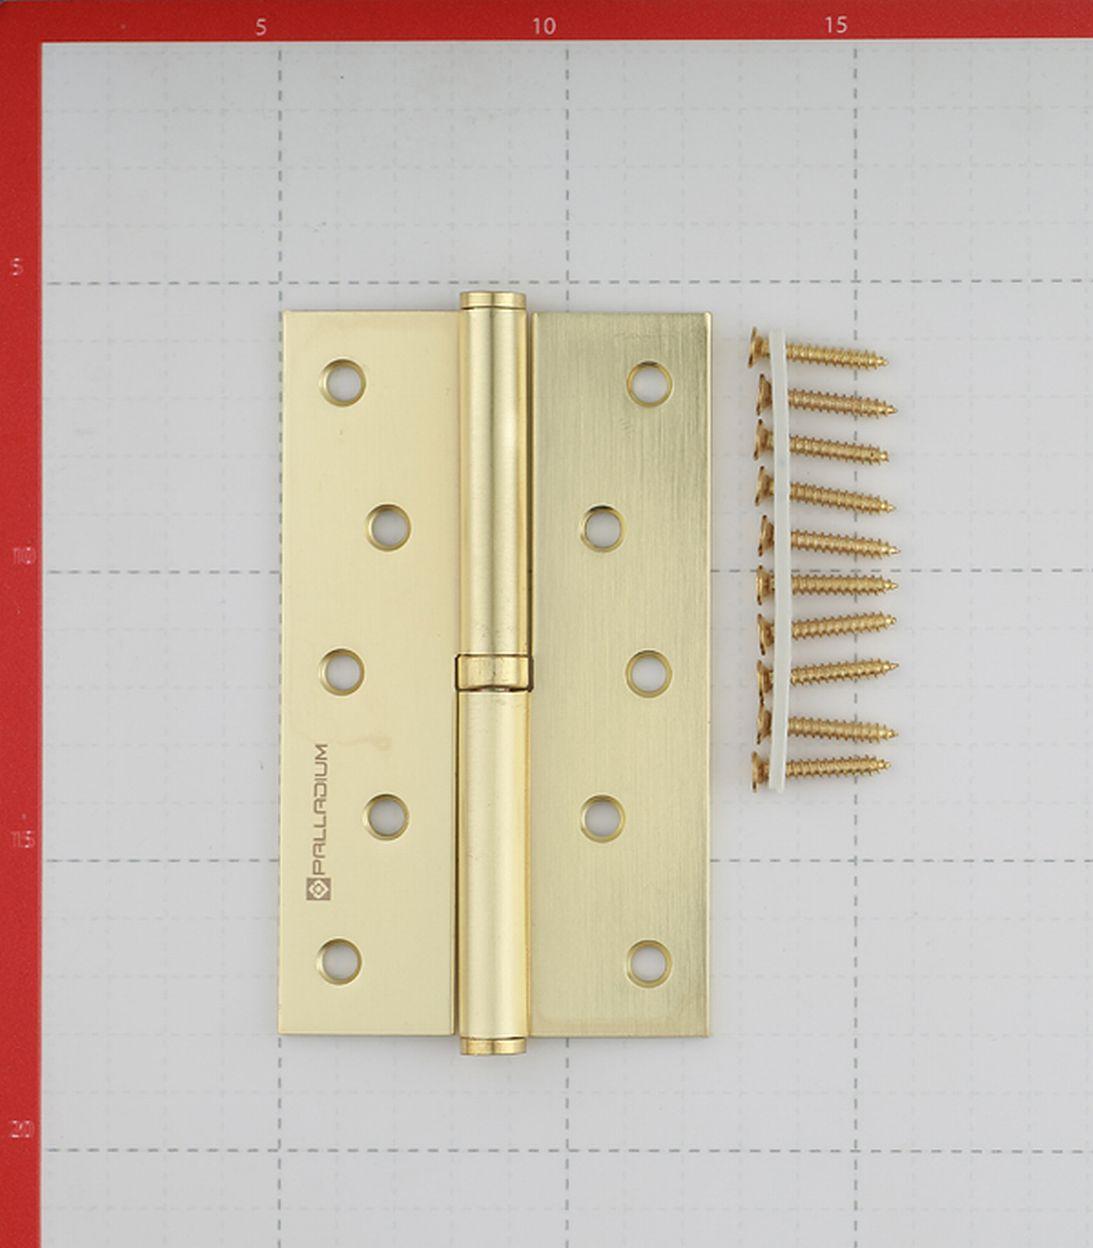 Петля Palladium N 613-S-5 SB левая разъемная 125х75 мм латунь